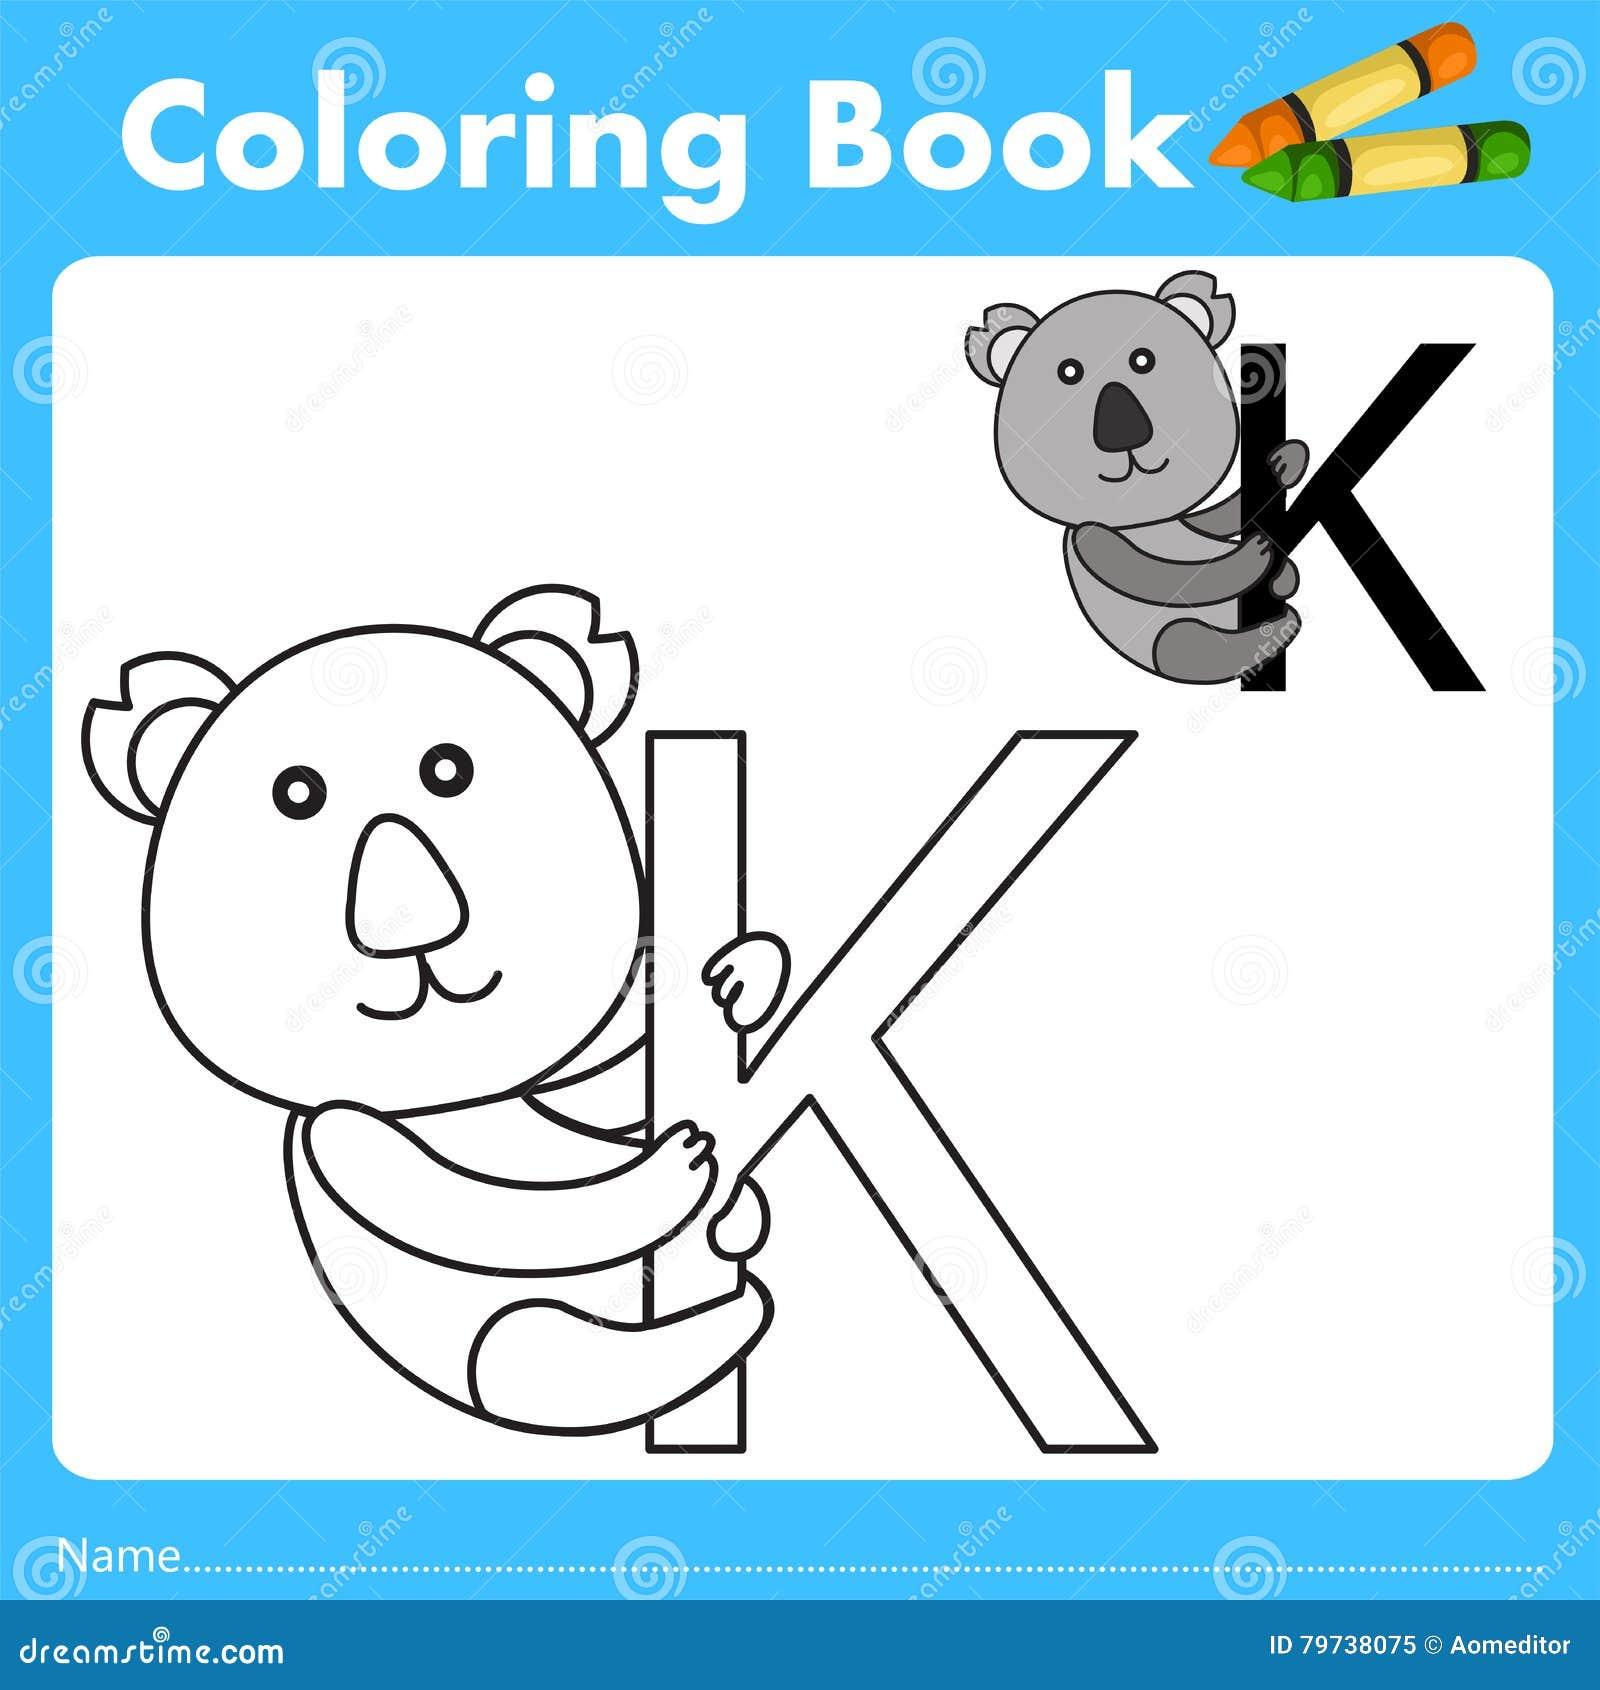 Book color illustrator - Illustrator Of Color Book With Koala Animal